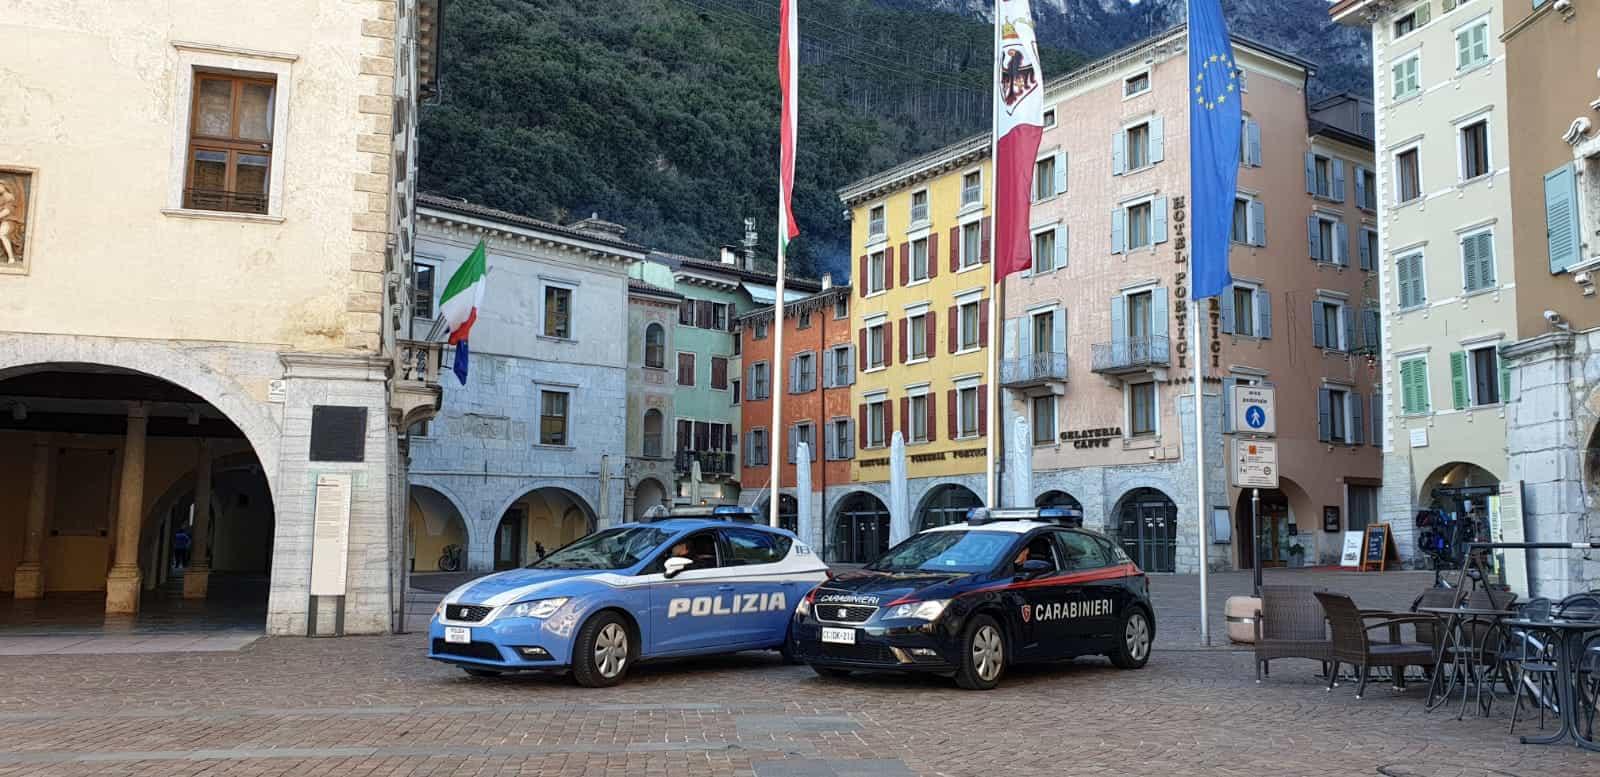 polizia e carabinieri a Riva